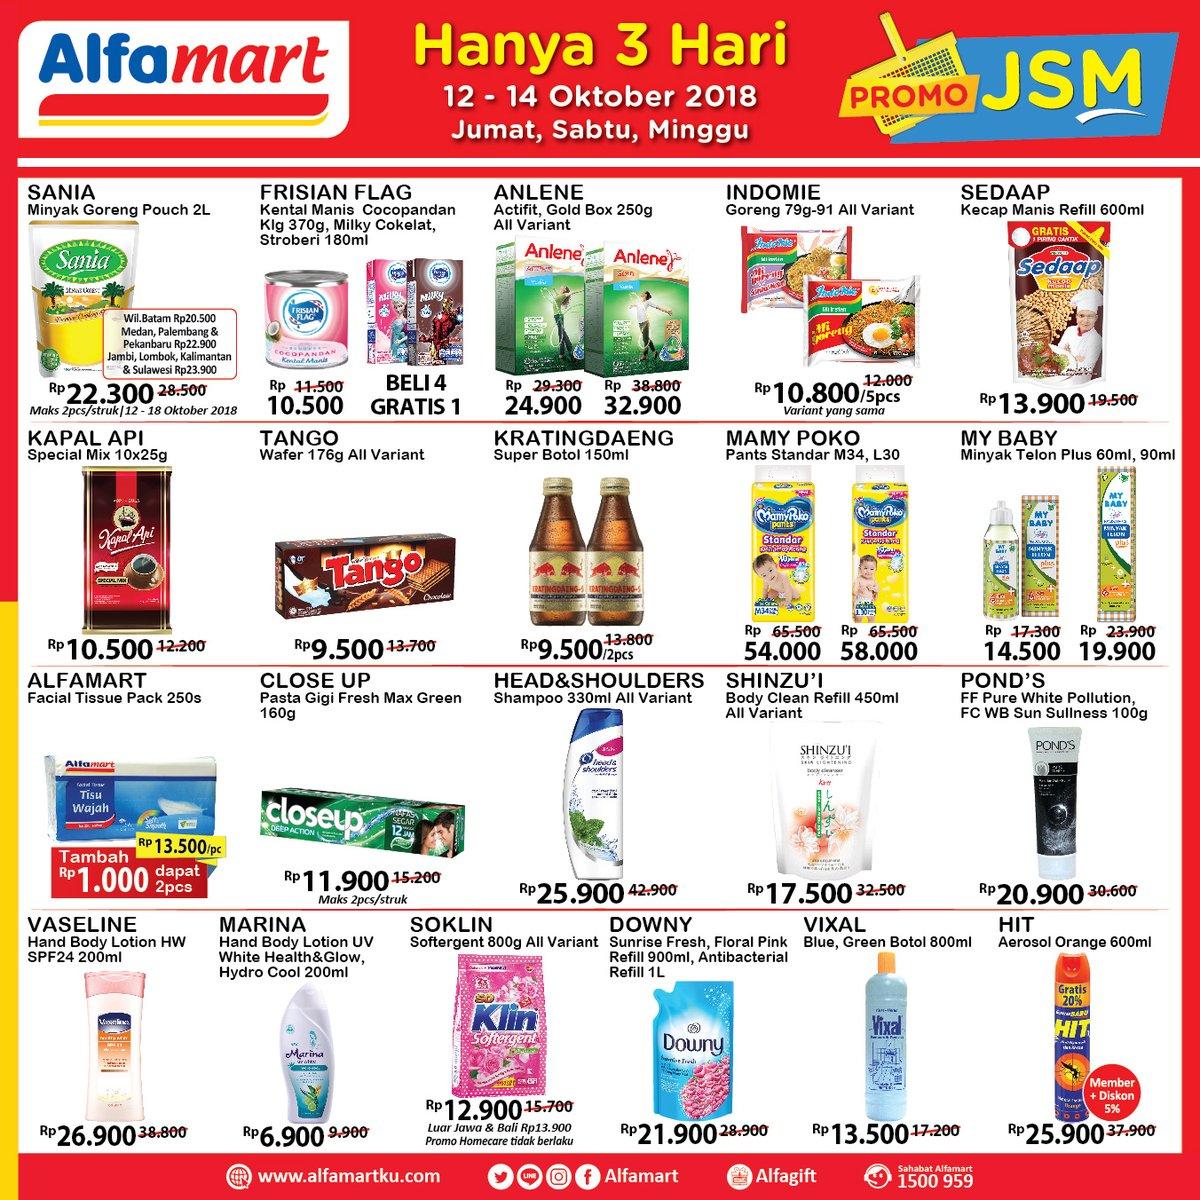 Alfamart - Promo Katalog JSM Periode 12 - 14 Oktober 2018